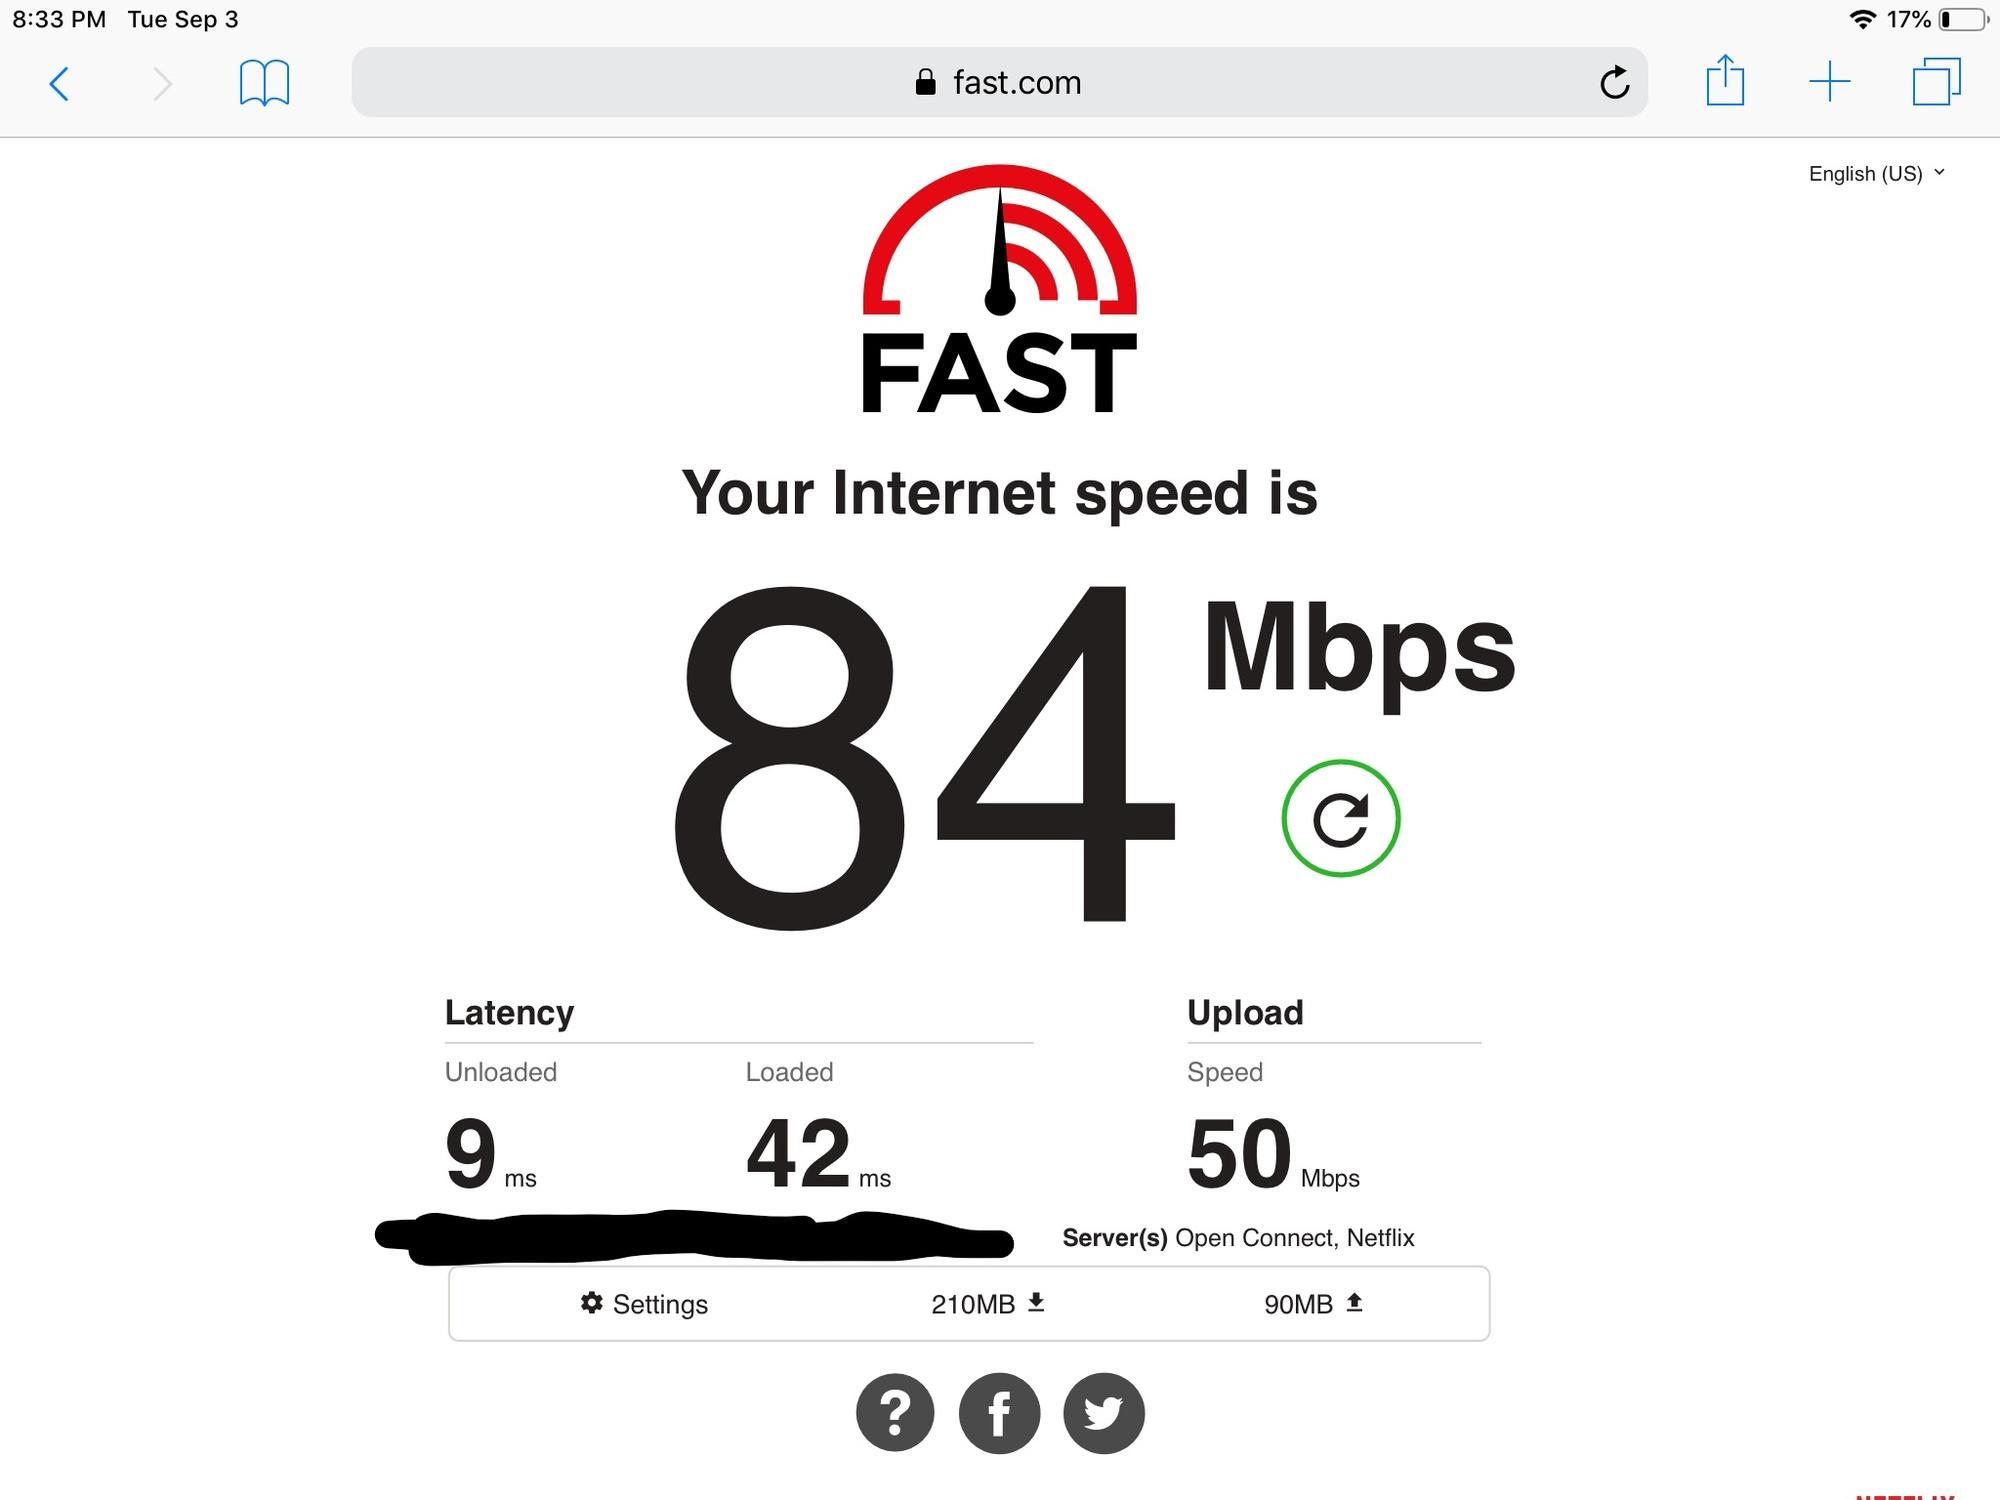 Bad wireless performance from Intel 3165 WiFi card 0bb6a0d5-232f-47ba-9e53-ab8716df00e8?upload=true.jpg